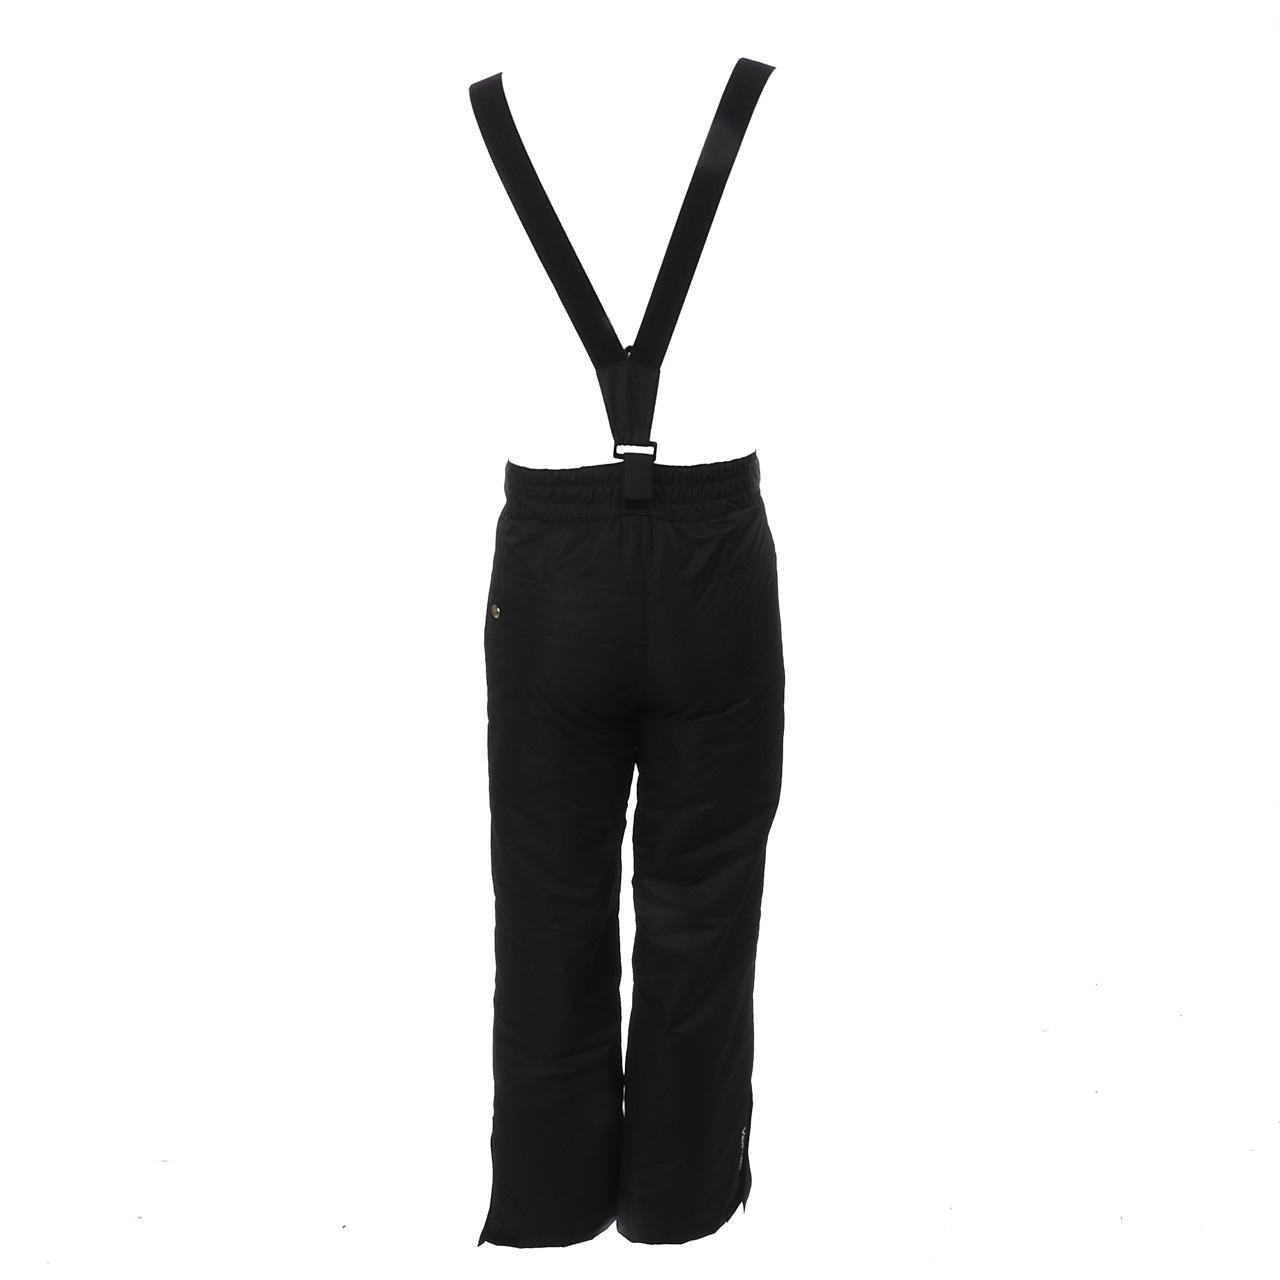 Pantalon-de-ski-surf-Alpes-vertigo-Testy-noir-pant-ski-jr-Noir-14604-Neuf miniature 4